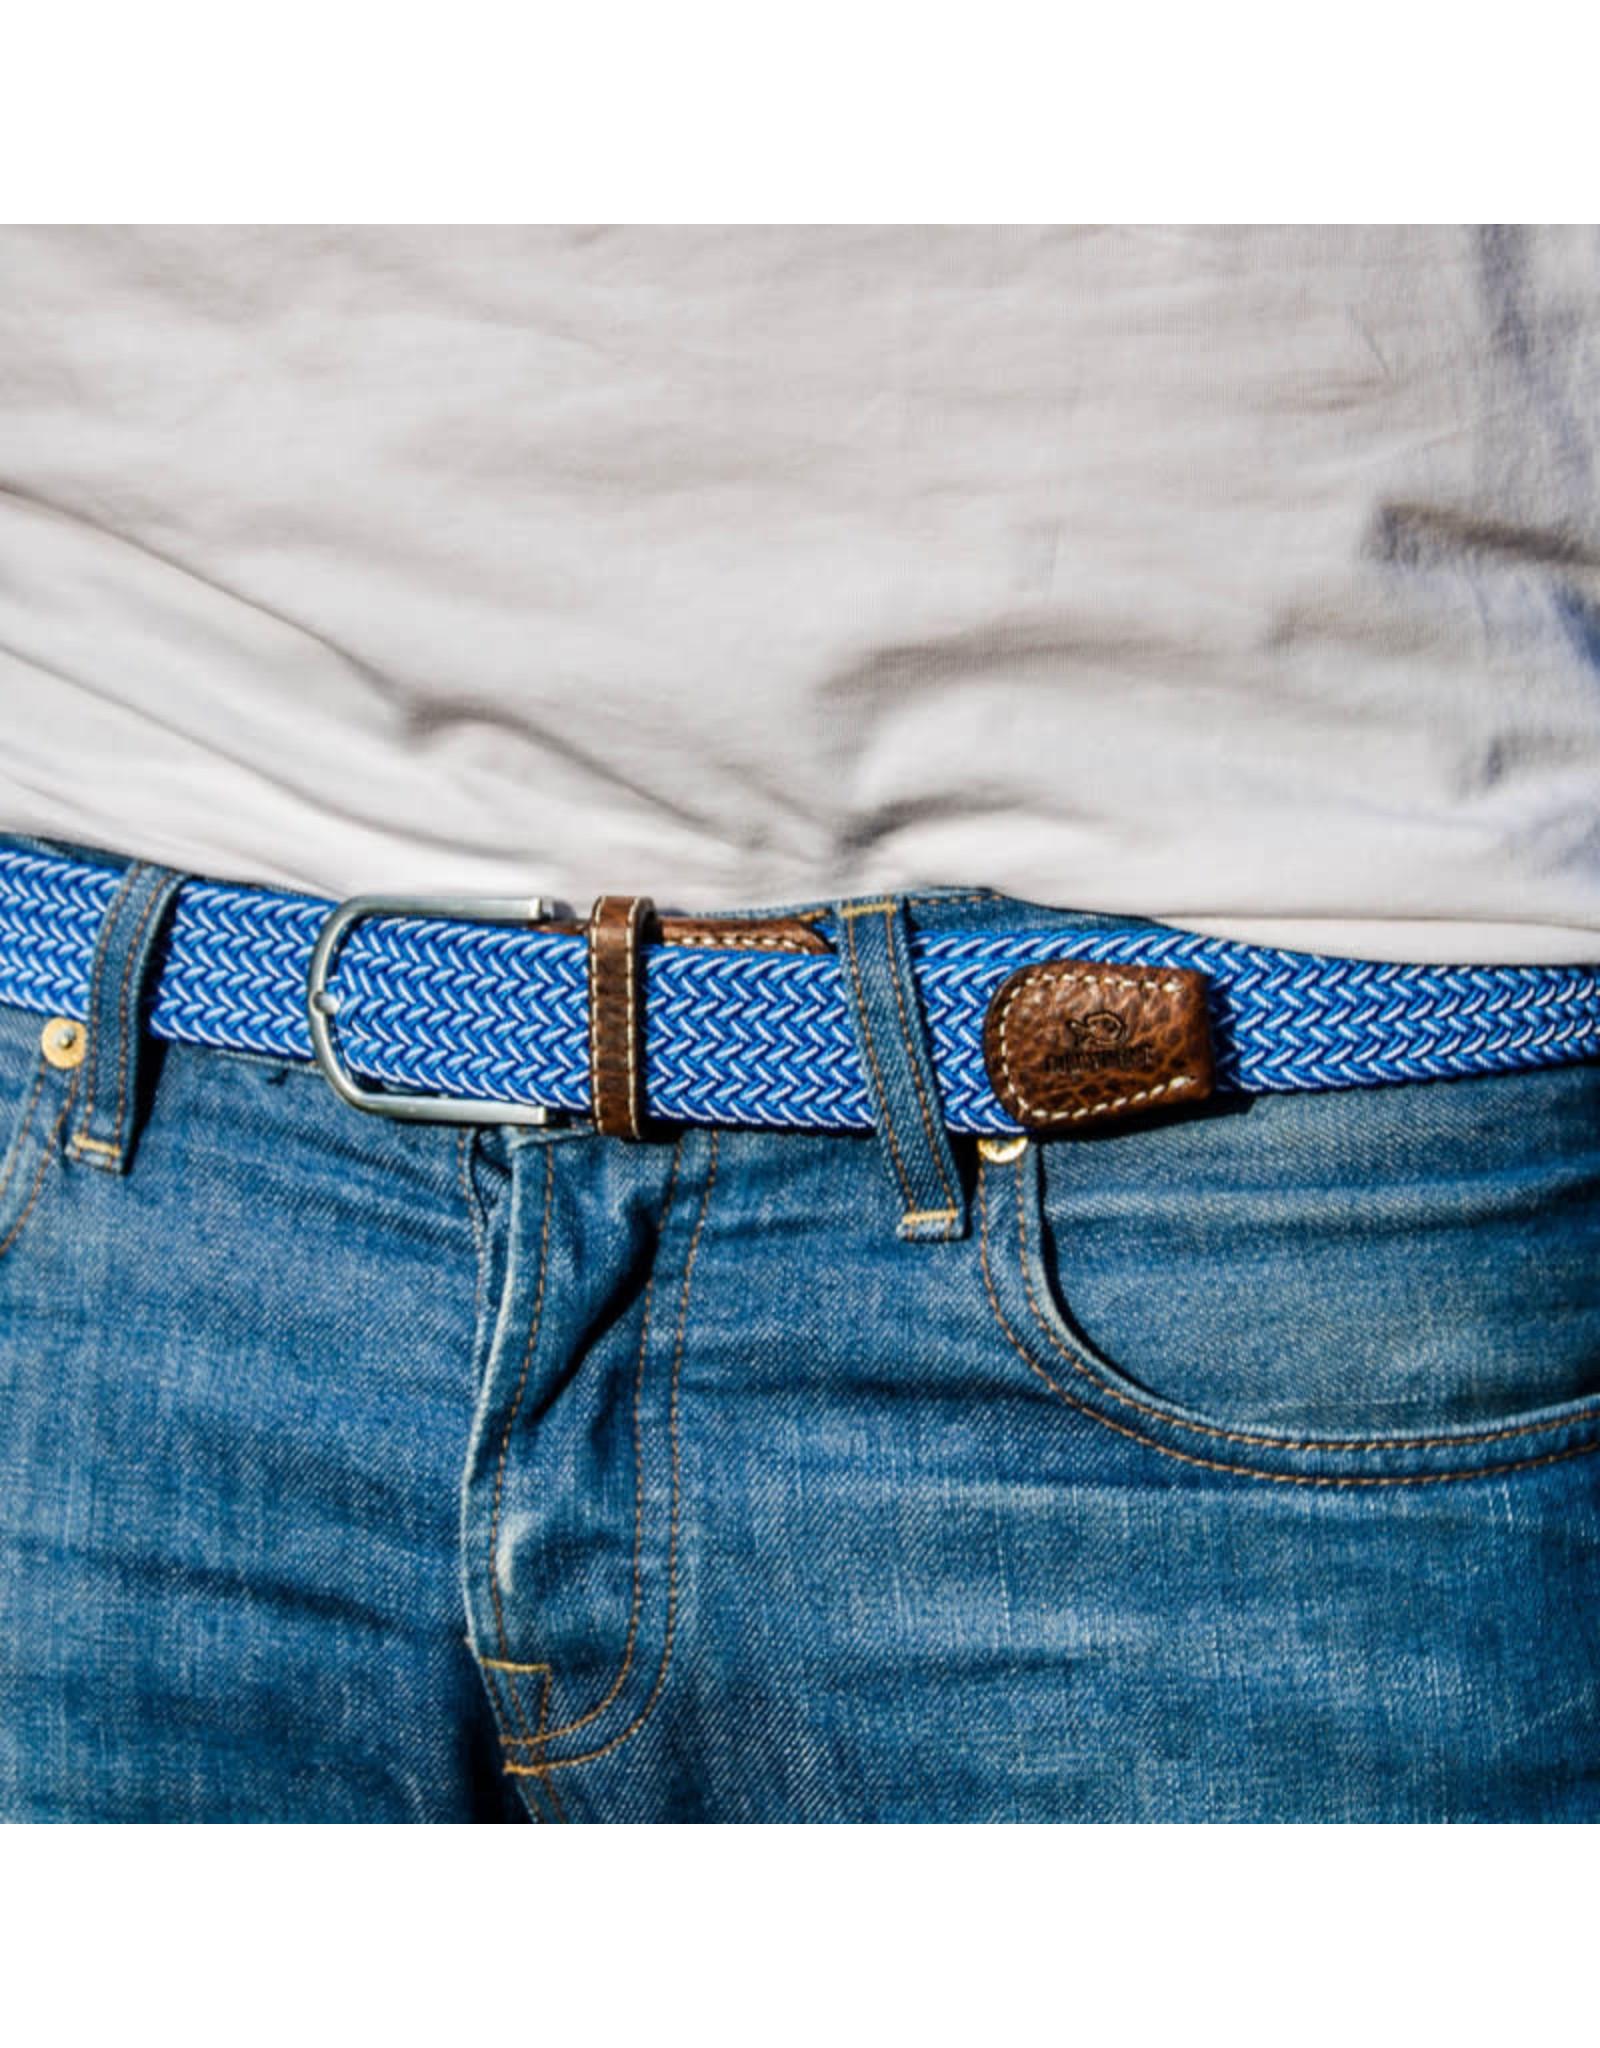 Riem visgraat blauw/ecru T1